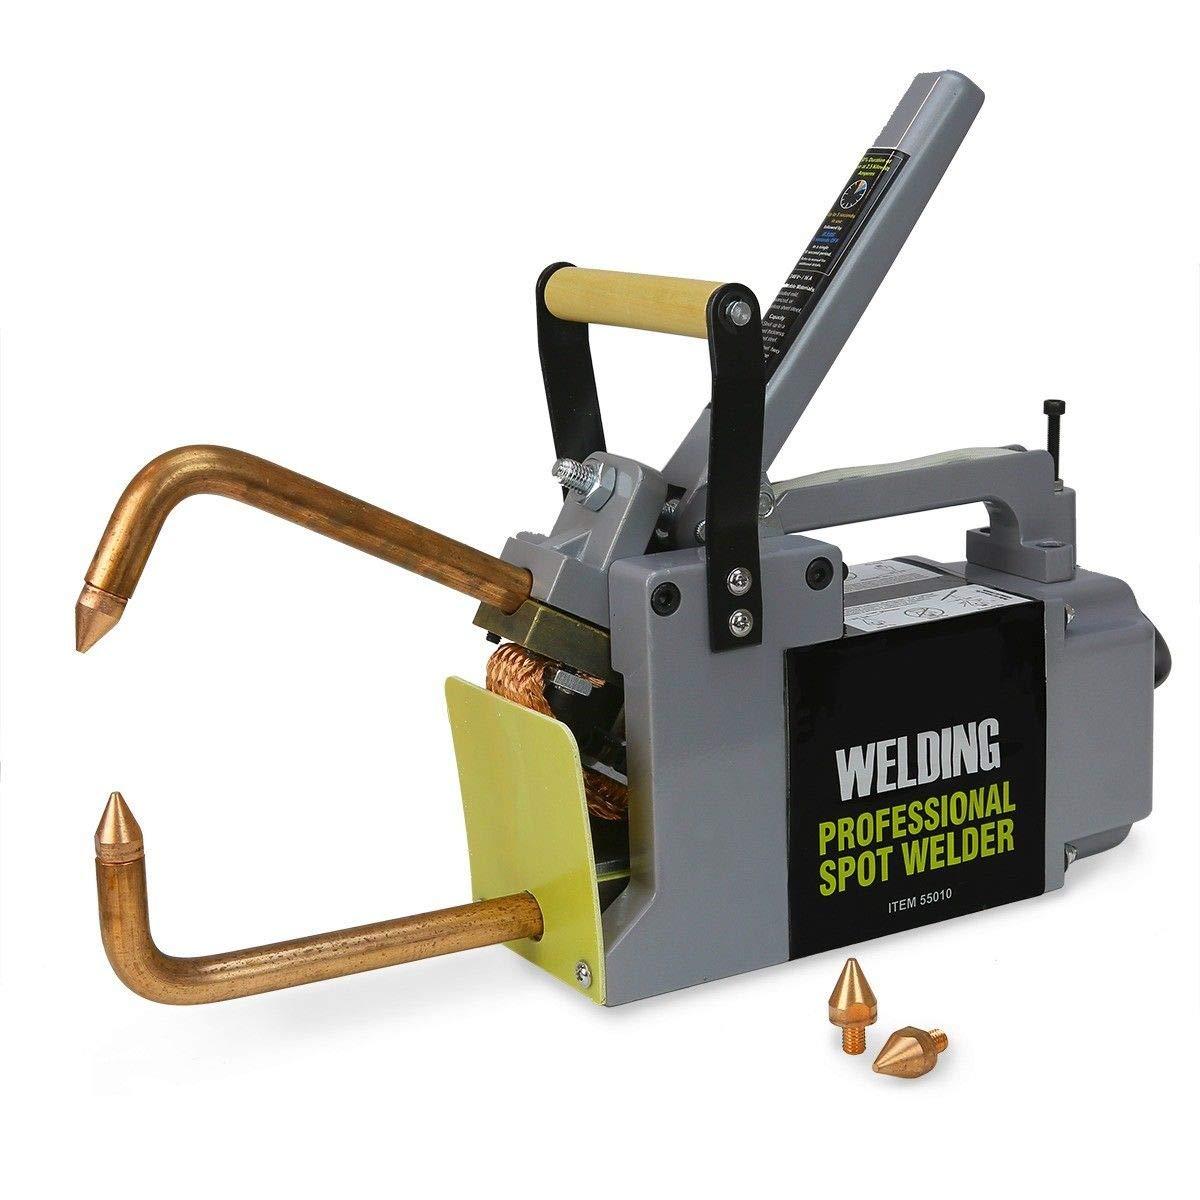 Stark Professional Electric 240 Volt Portable Spot Welder Machine Welding Systems DIY Welding Tips with Handle